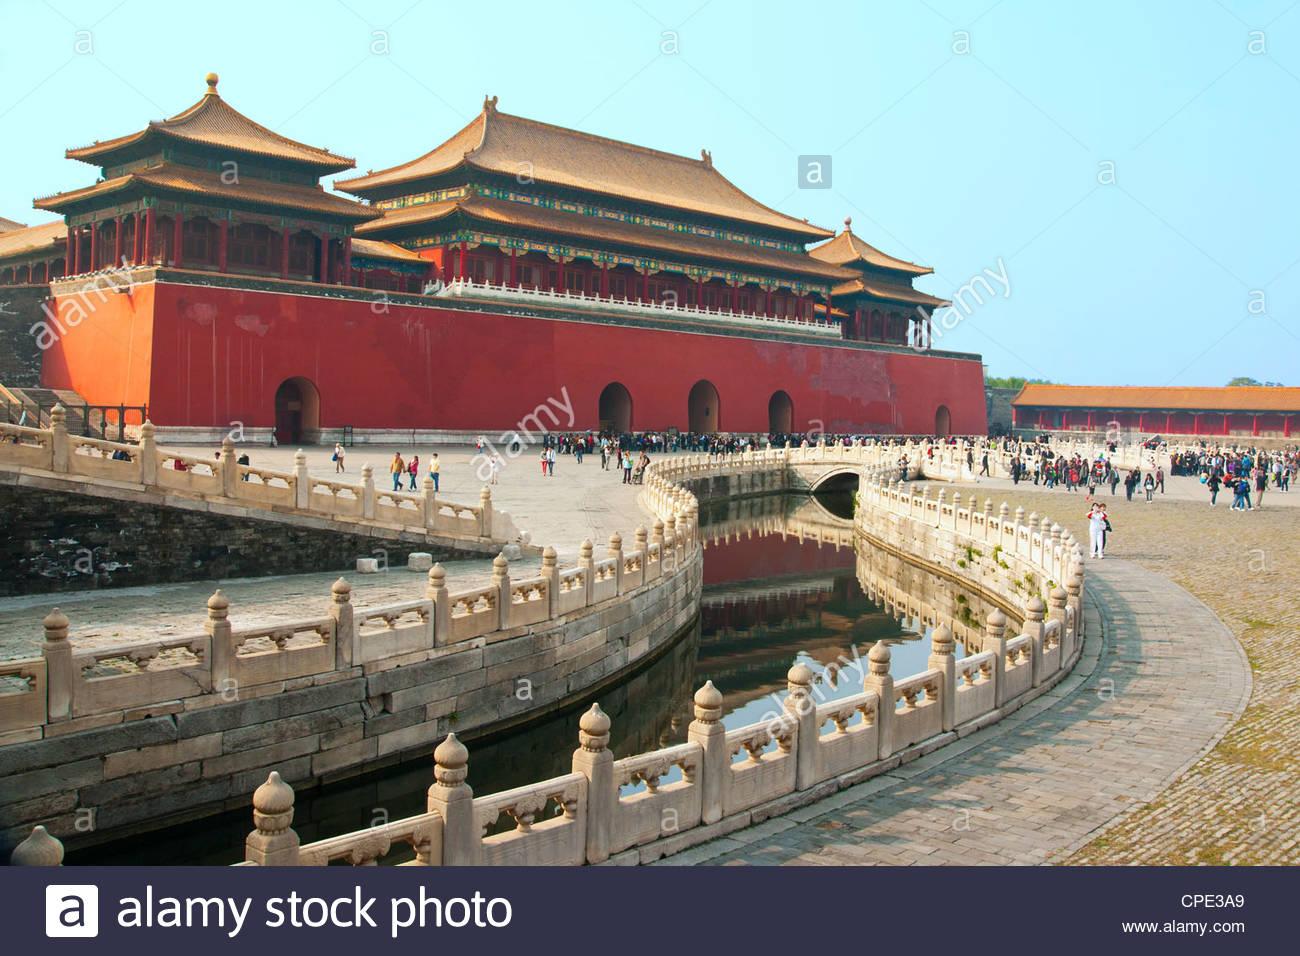 Fleuve d'Or, la Cité Interdite, Beijing, China, Asia Photo Stock